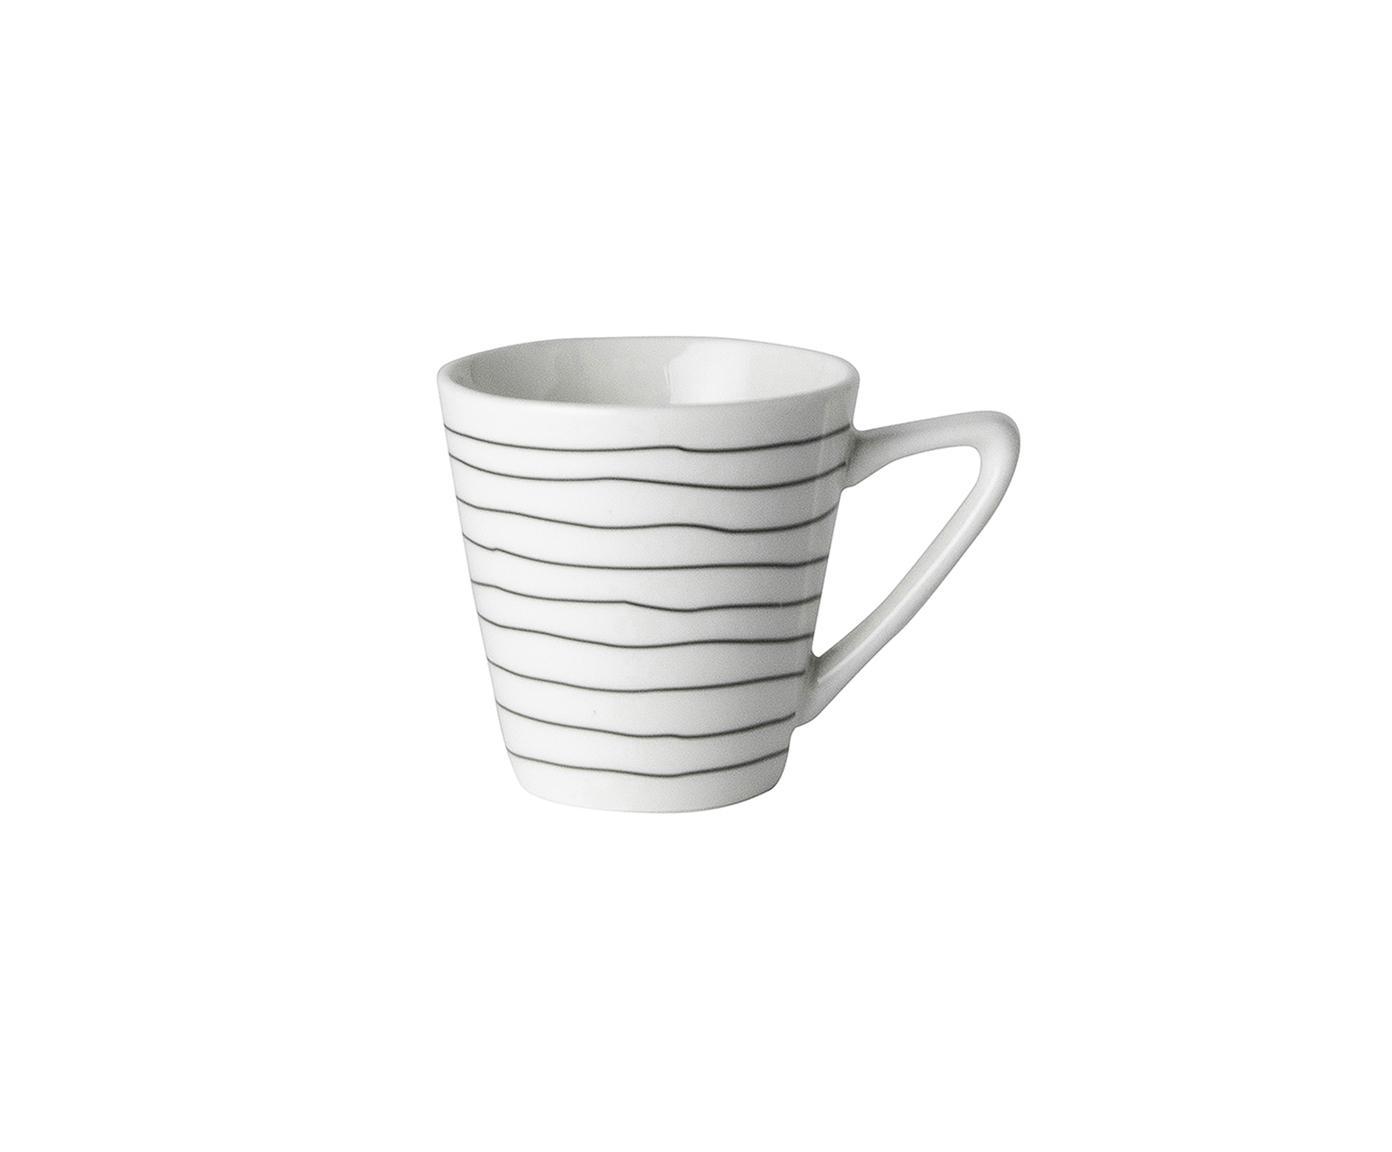 Espressokopjes Eris Loft, 4 stuks, Porselein, Wit, zwart, Ø 6 x H 6 cm